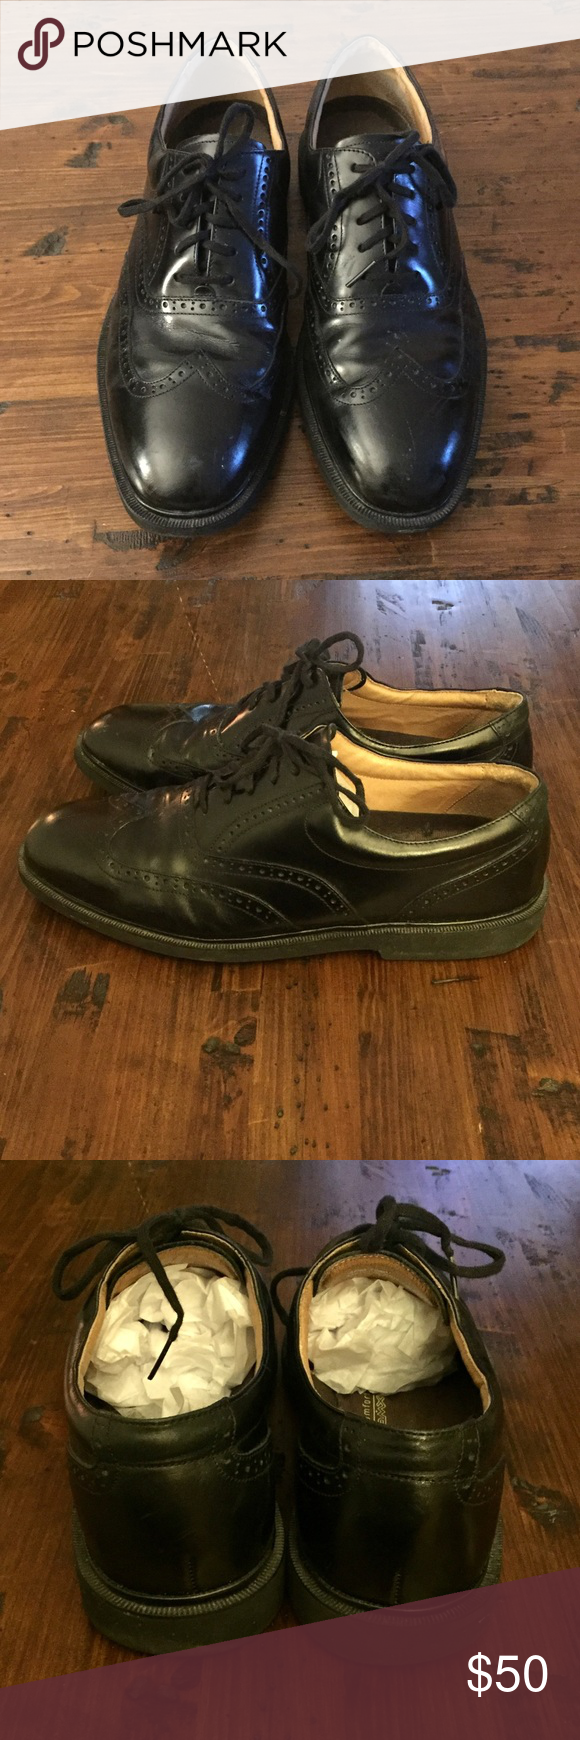 Rockport Wing Tip Dress Shoes